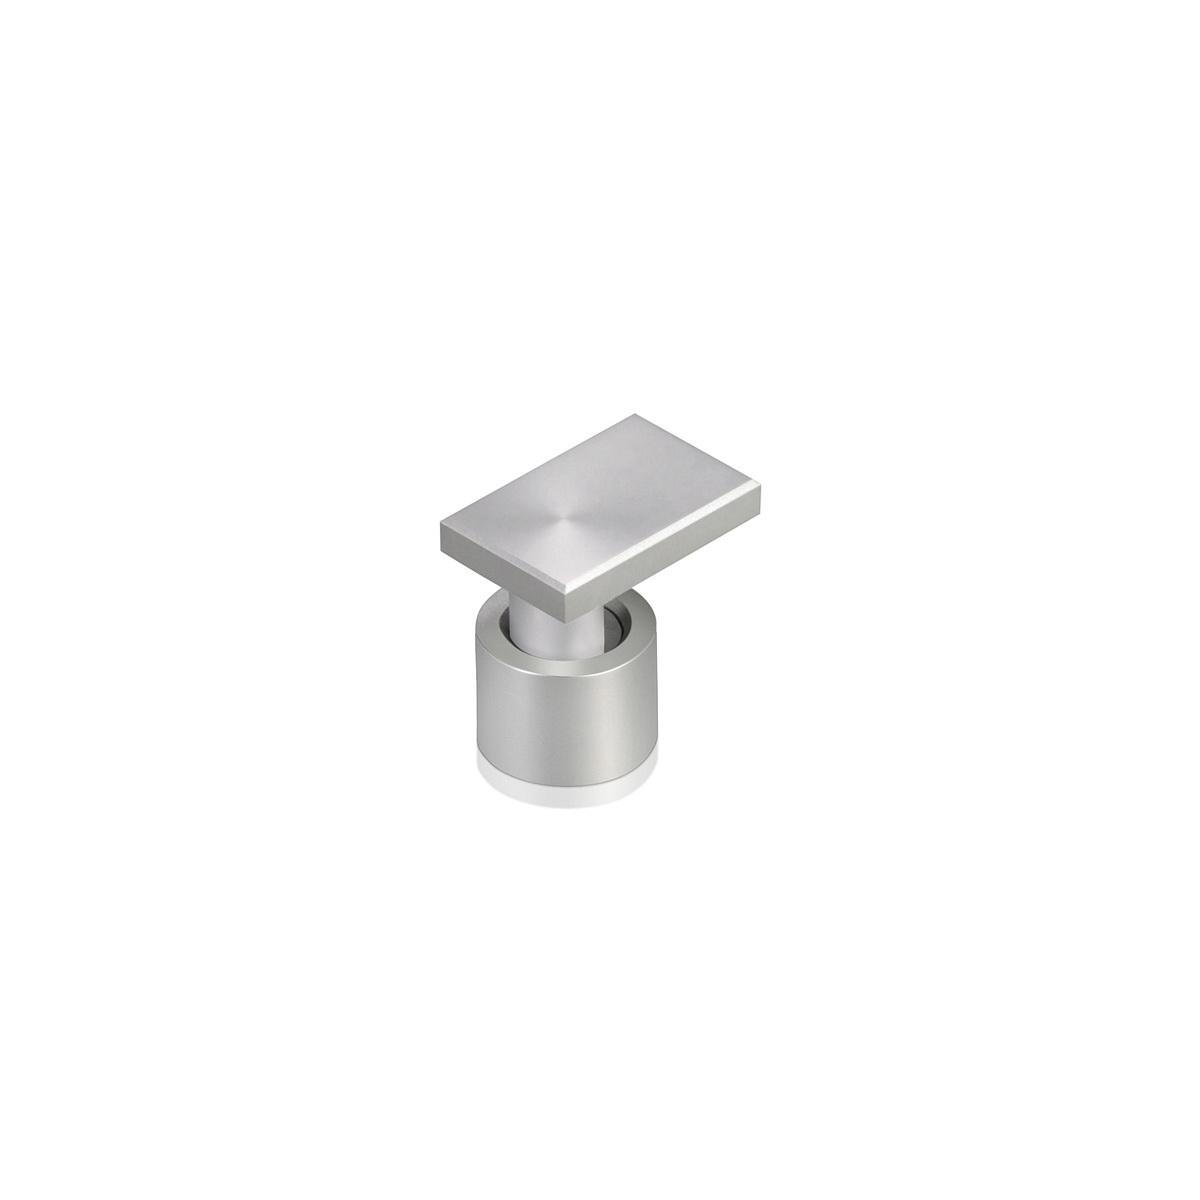 Rectangular Aluminum Edge Grip, Diameter 1/2'', Standoff 3/8'' Face: 3/4'' x 1/2'' Clear Anodize Finish